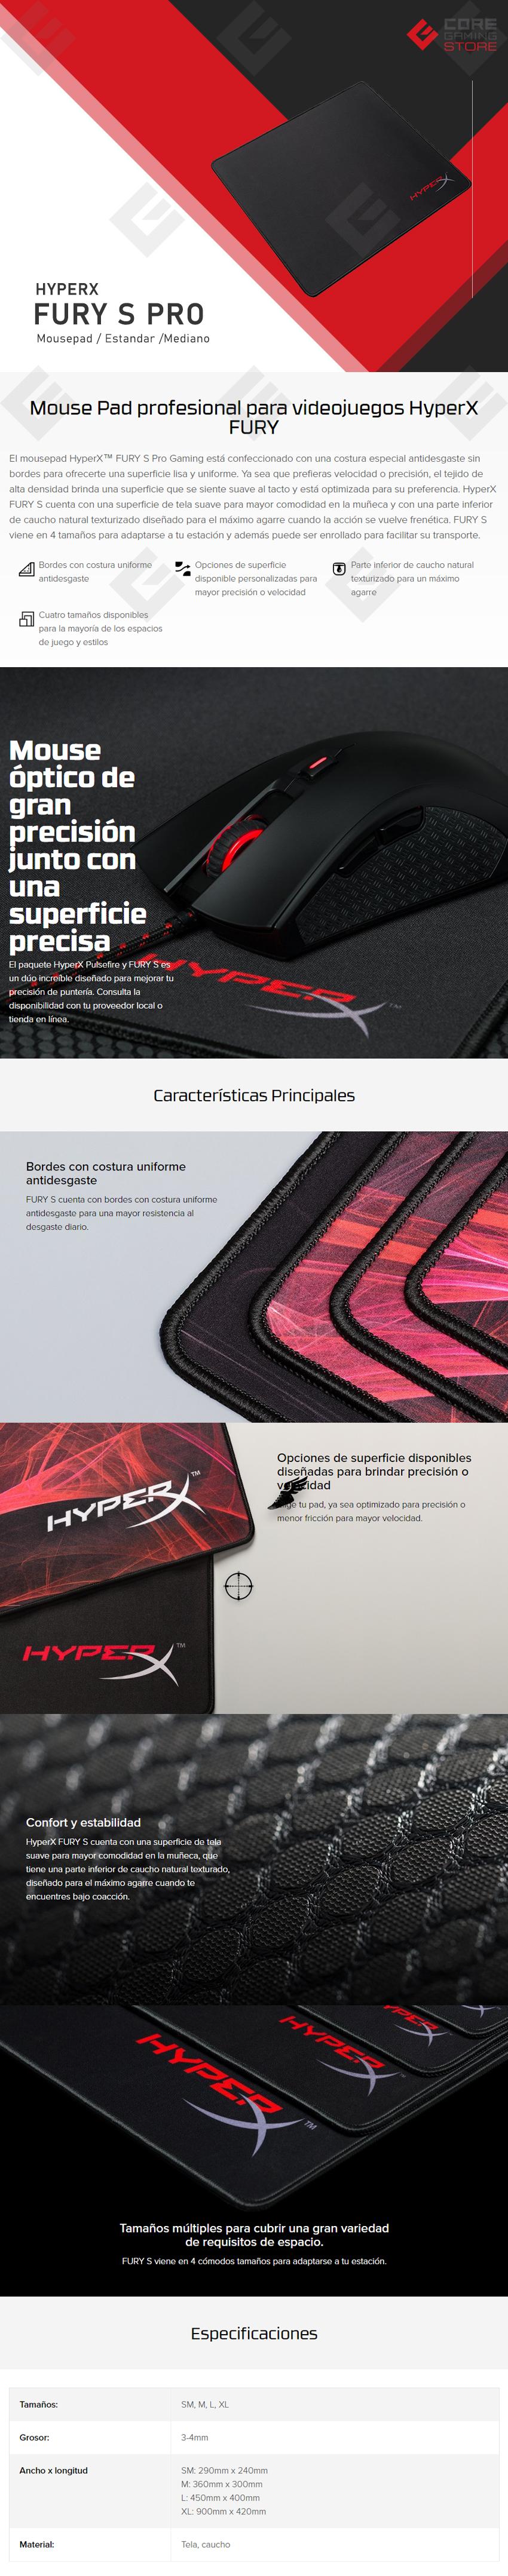 Mousepad HyperX Fury S Pro, Standar Edition, Mediano, 360x300x4mm, HX-MPFS-M